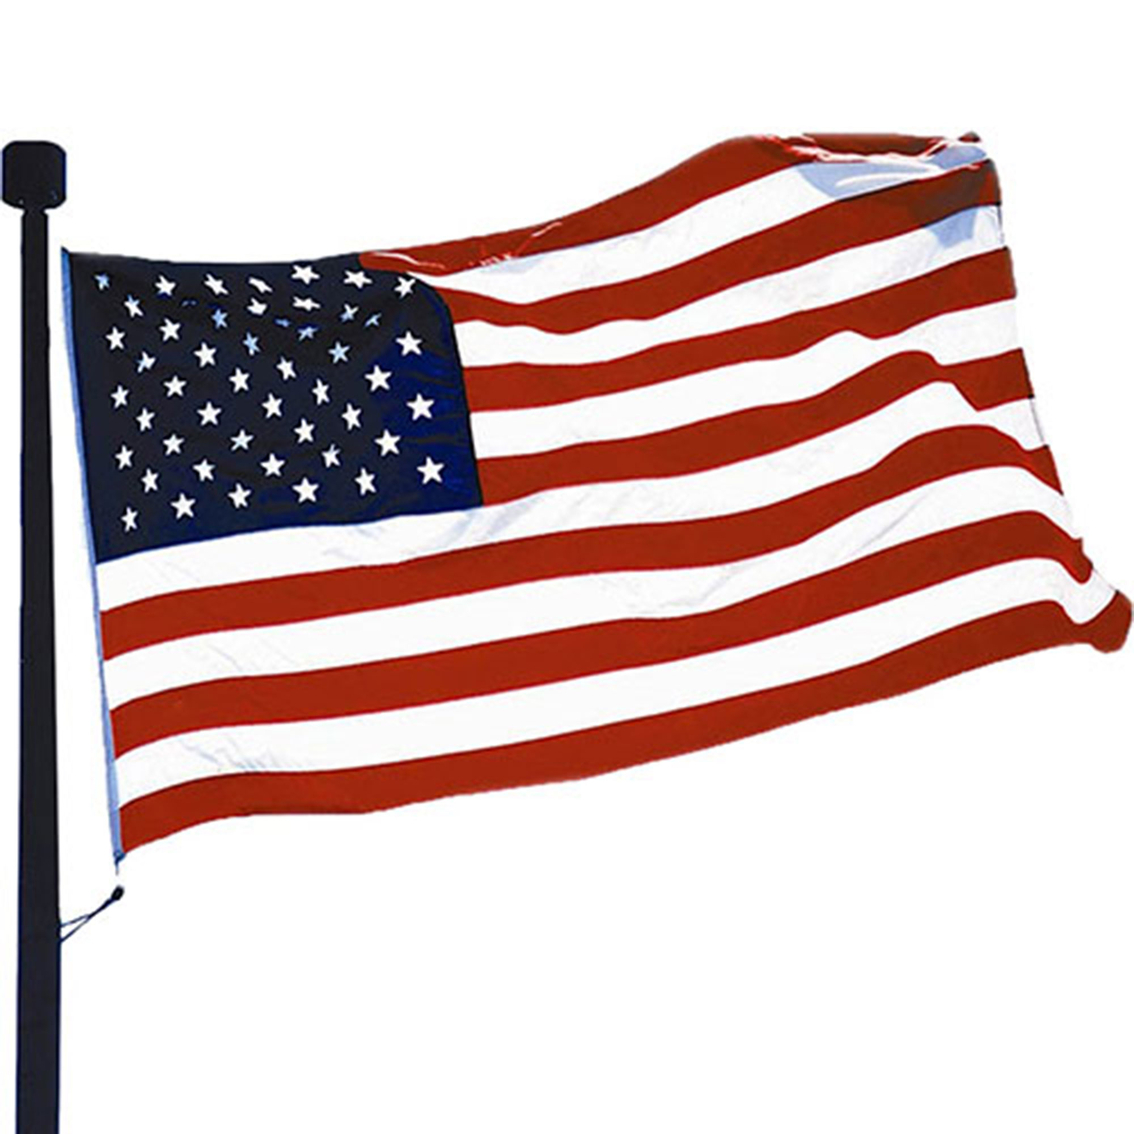 1134x1134 Annin Nylon 3x5 Ft. American Flag U.s. Flags Gifts Amp Food